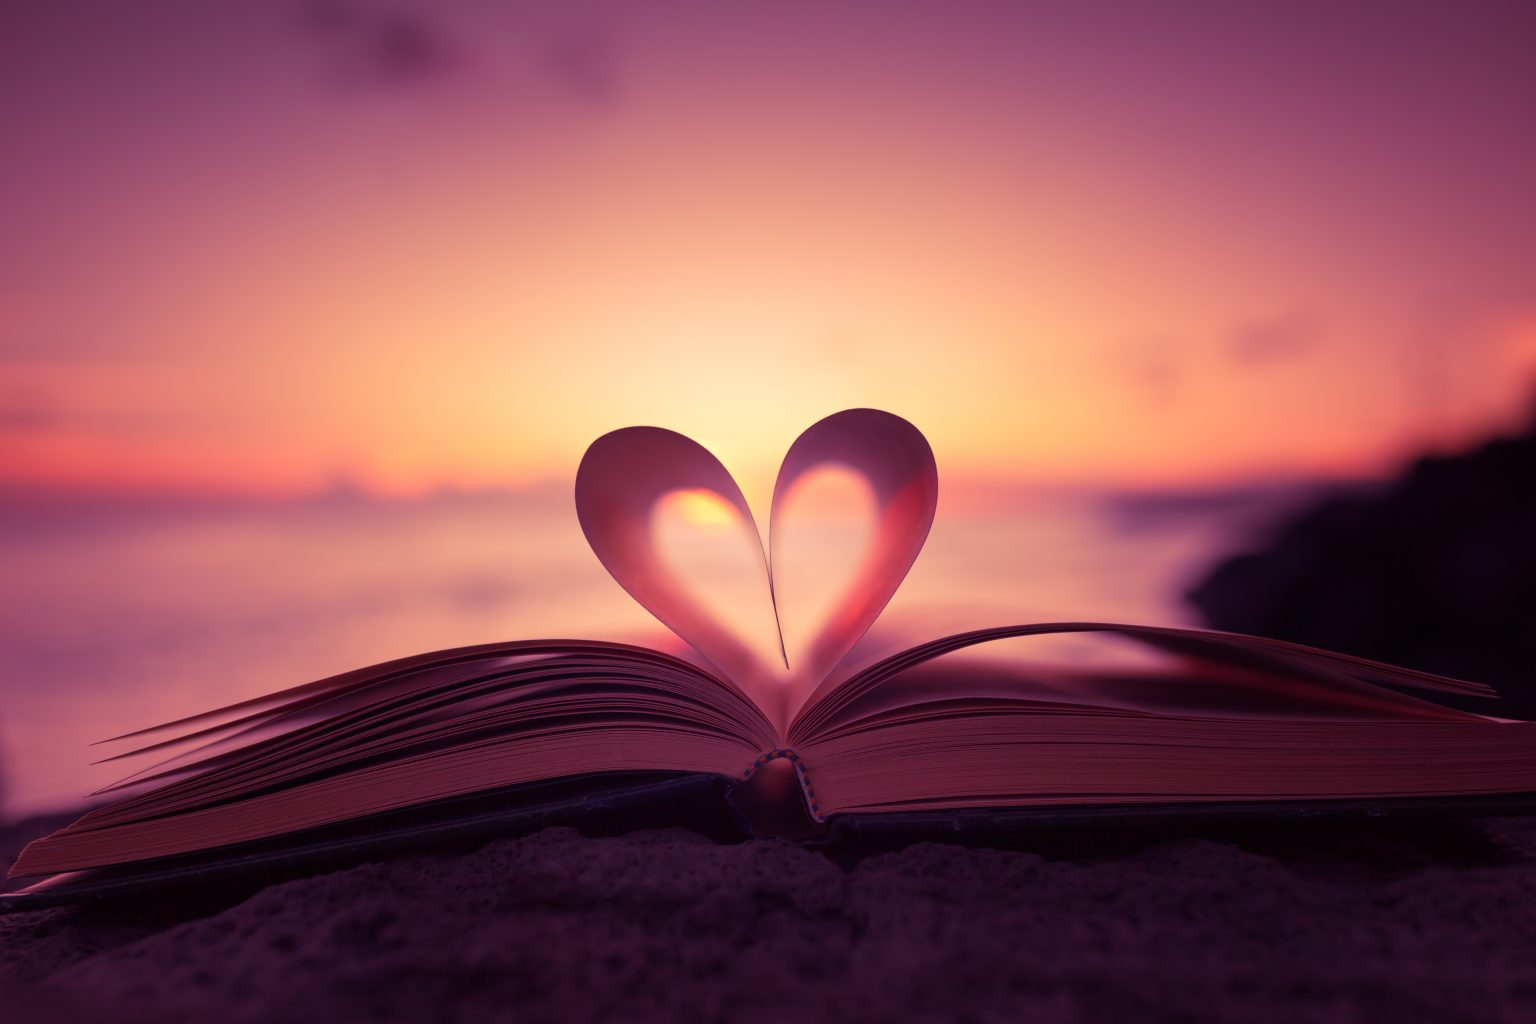 Love Truth and Spirit, integritysyndicate.com